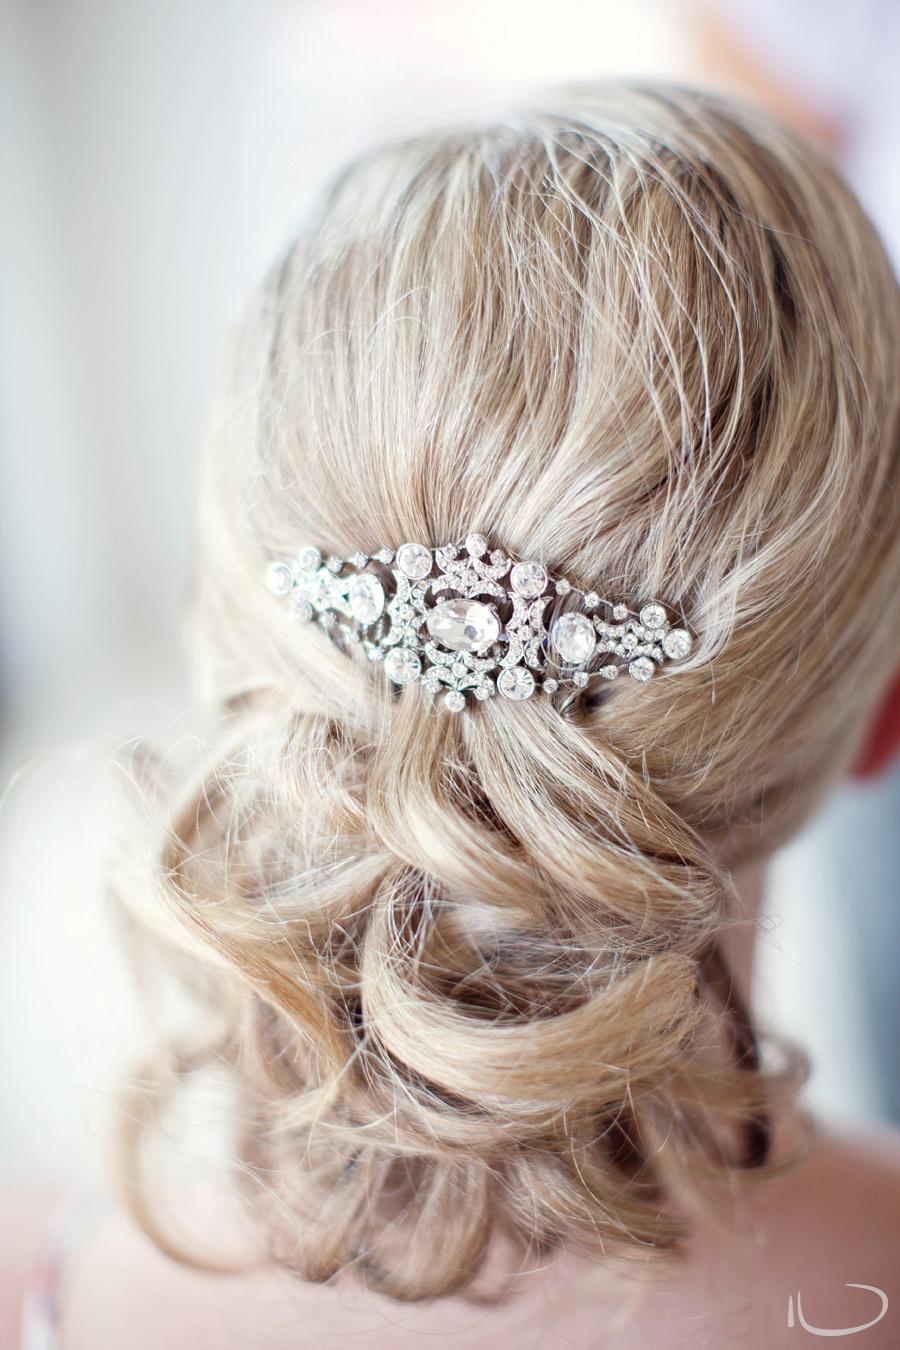 Cronulla Wedding Photographer: Bride's hairpiece